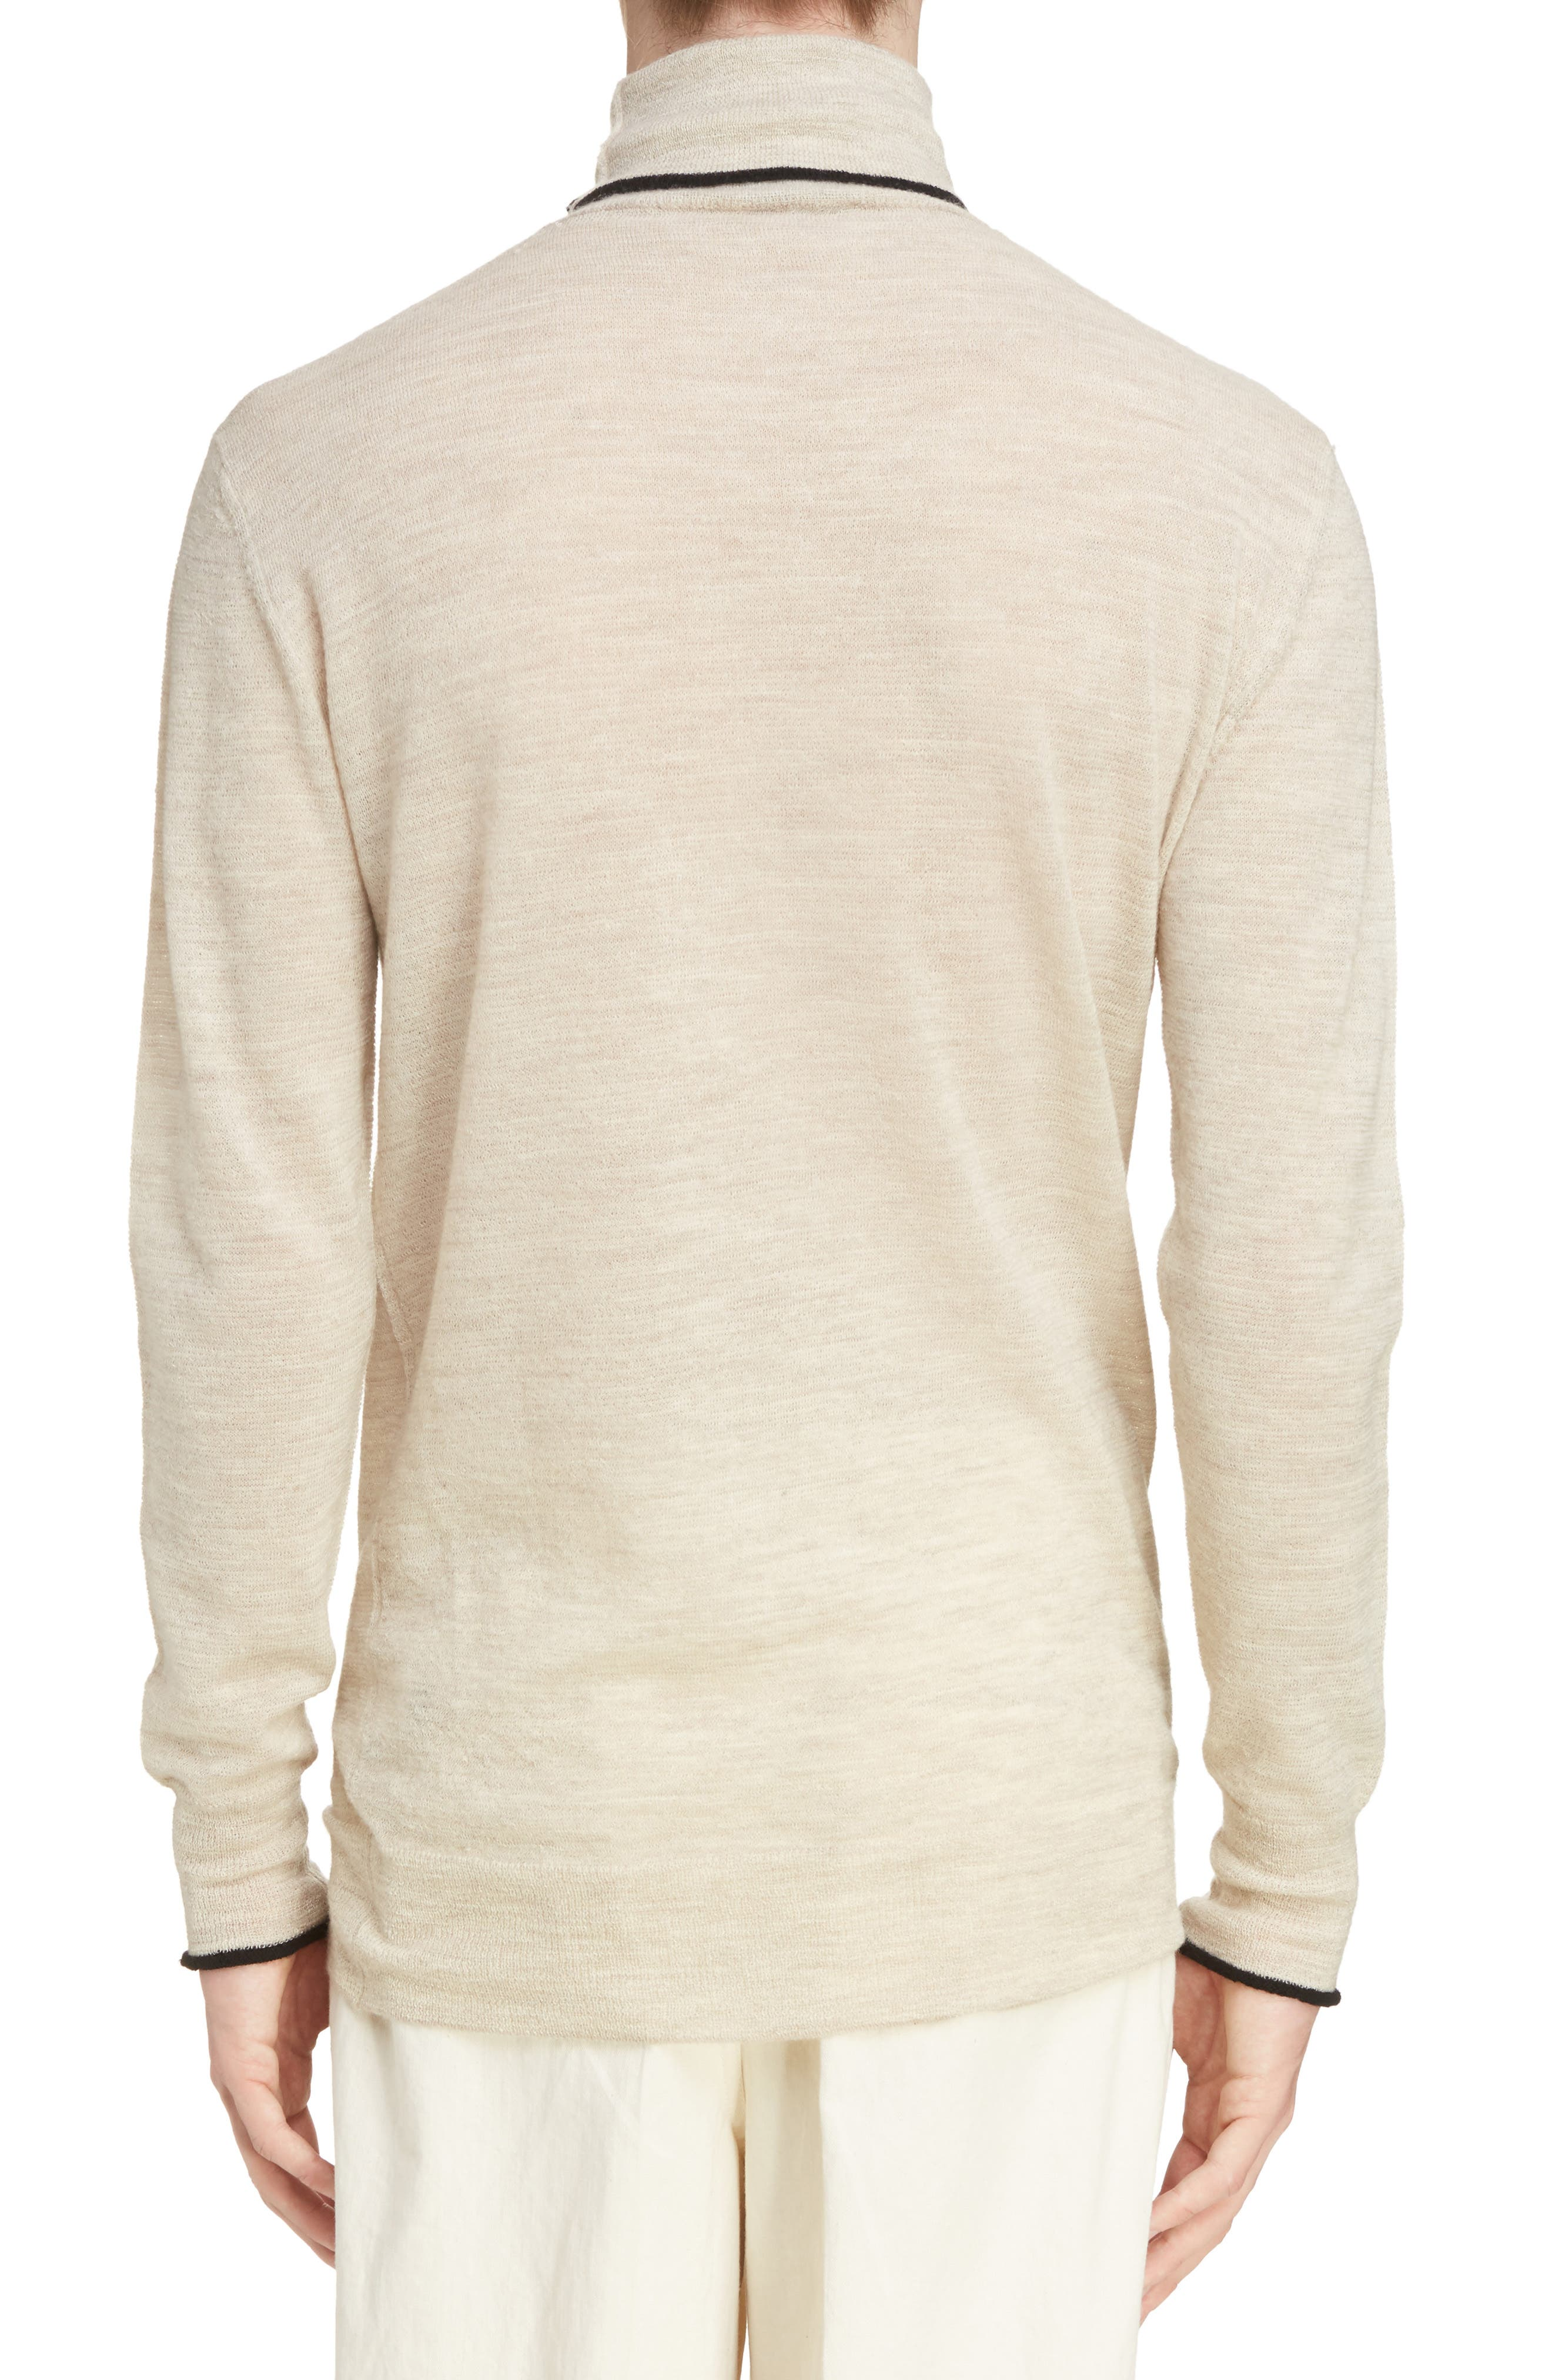 Alternate Image 2  - Lanvin Contrast Tipped Wool Turtleneck